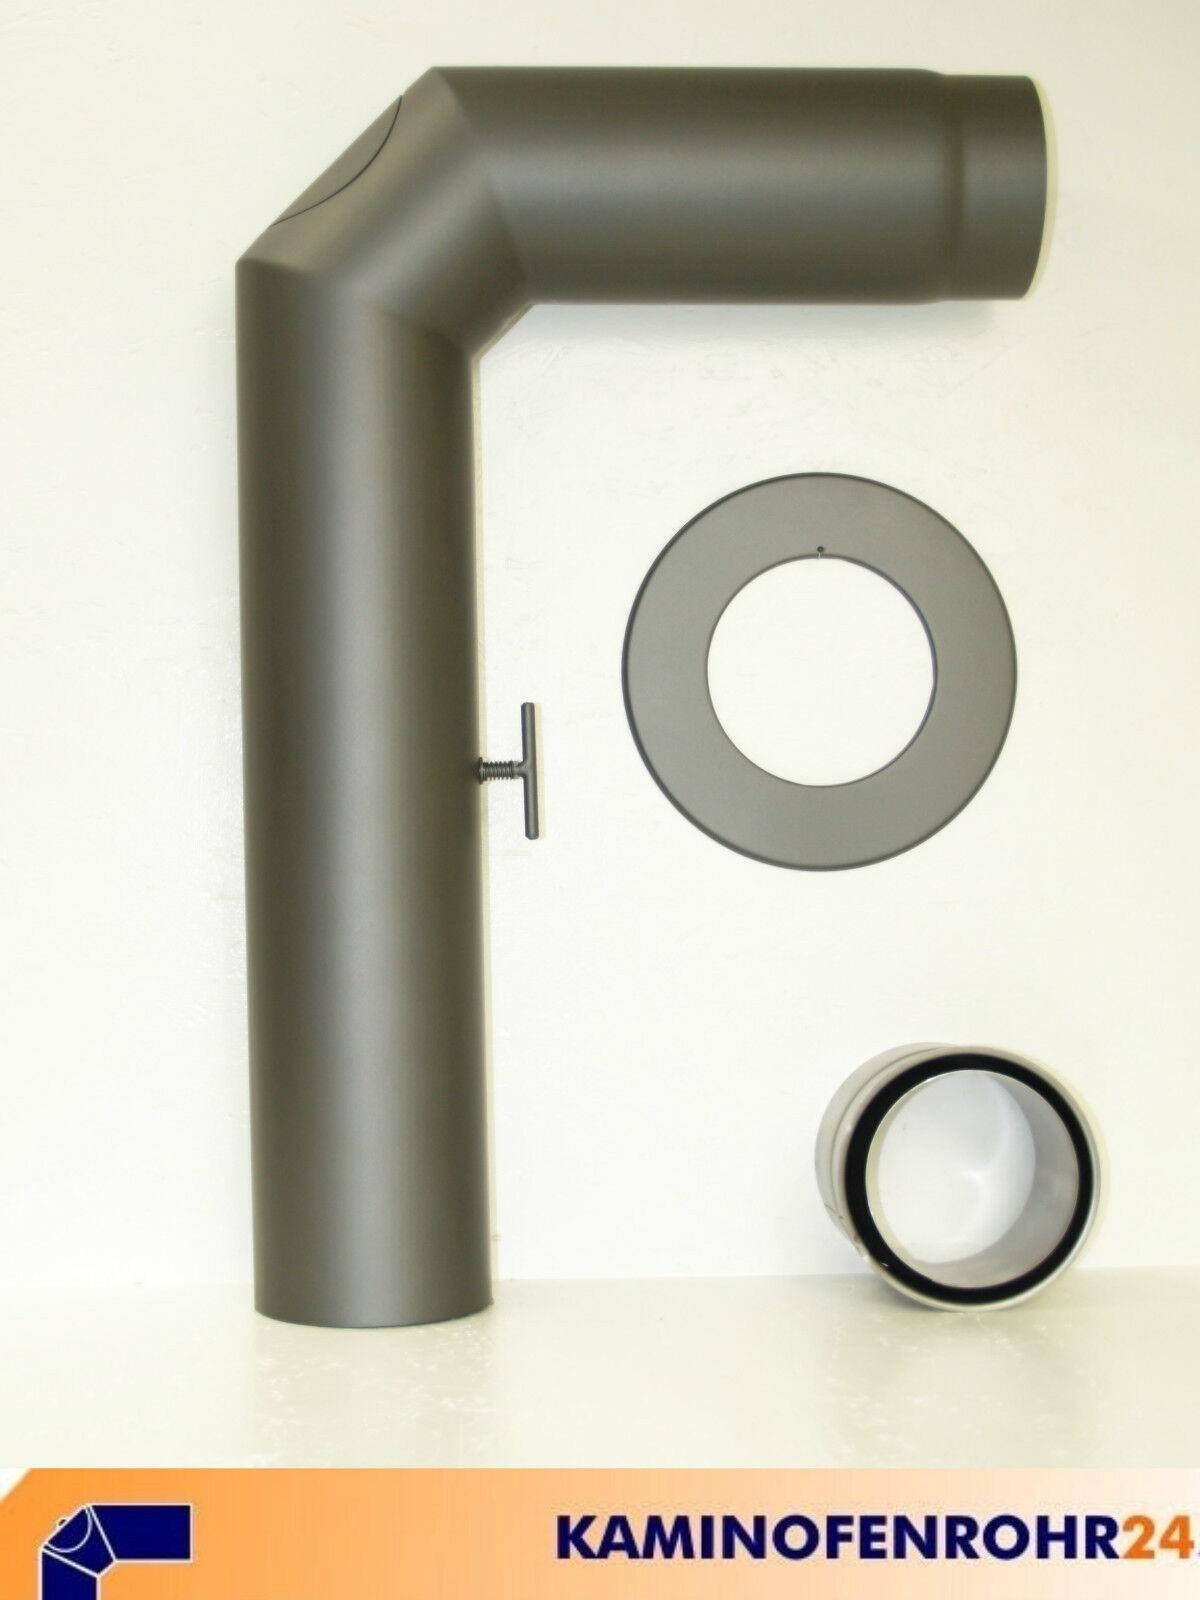 Horno de tubo humo tubo rauchrohrset 3tlg. set gris Ø 130mm